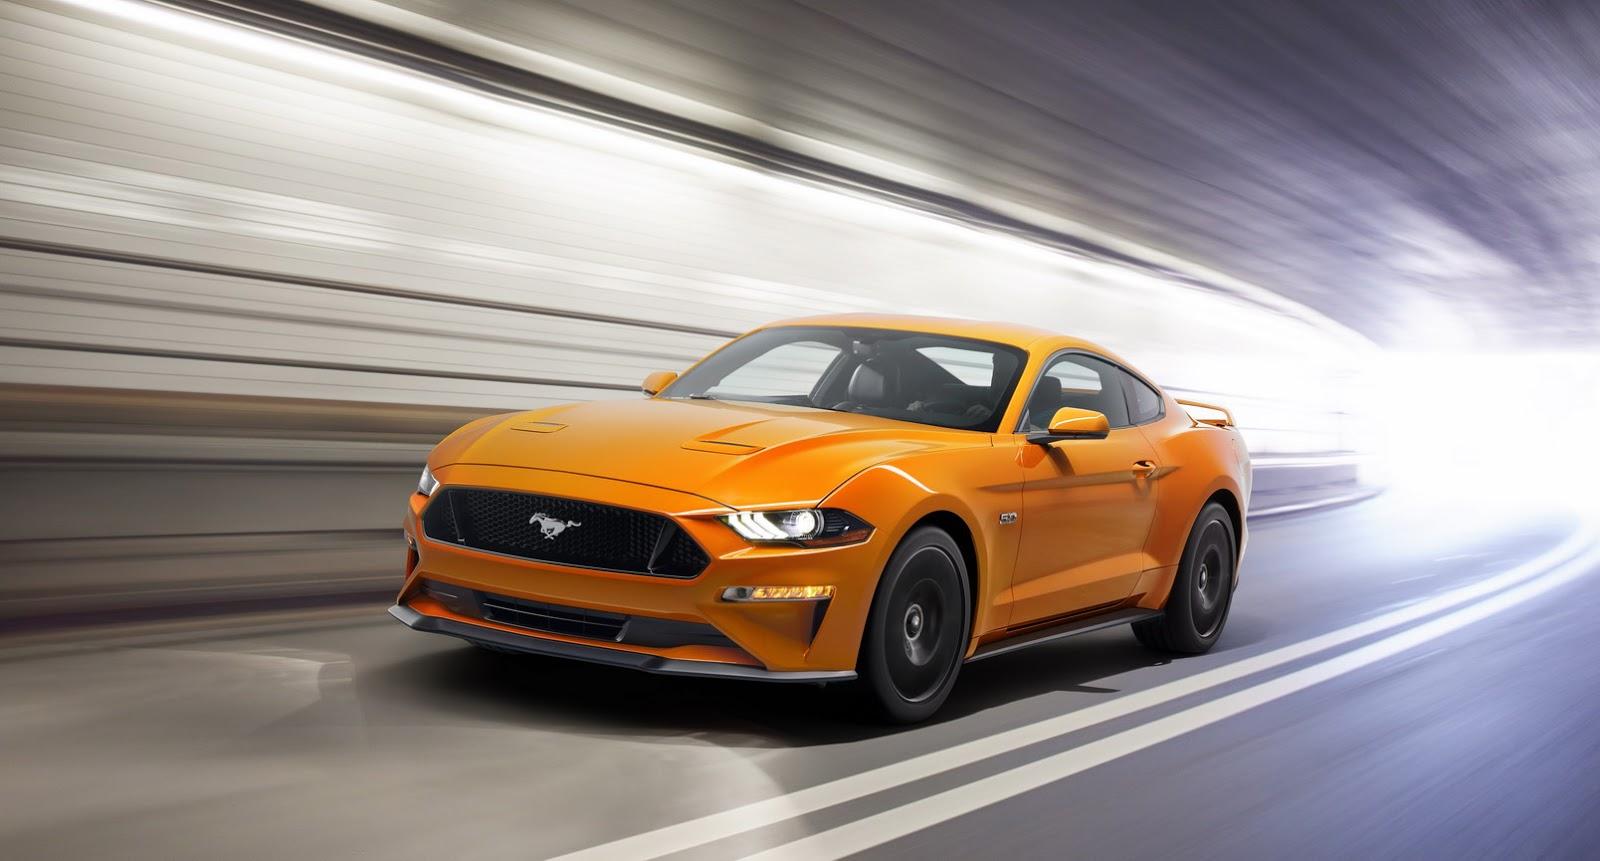 New-Mustang-18-1